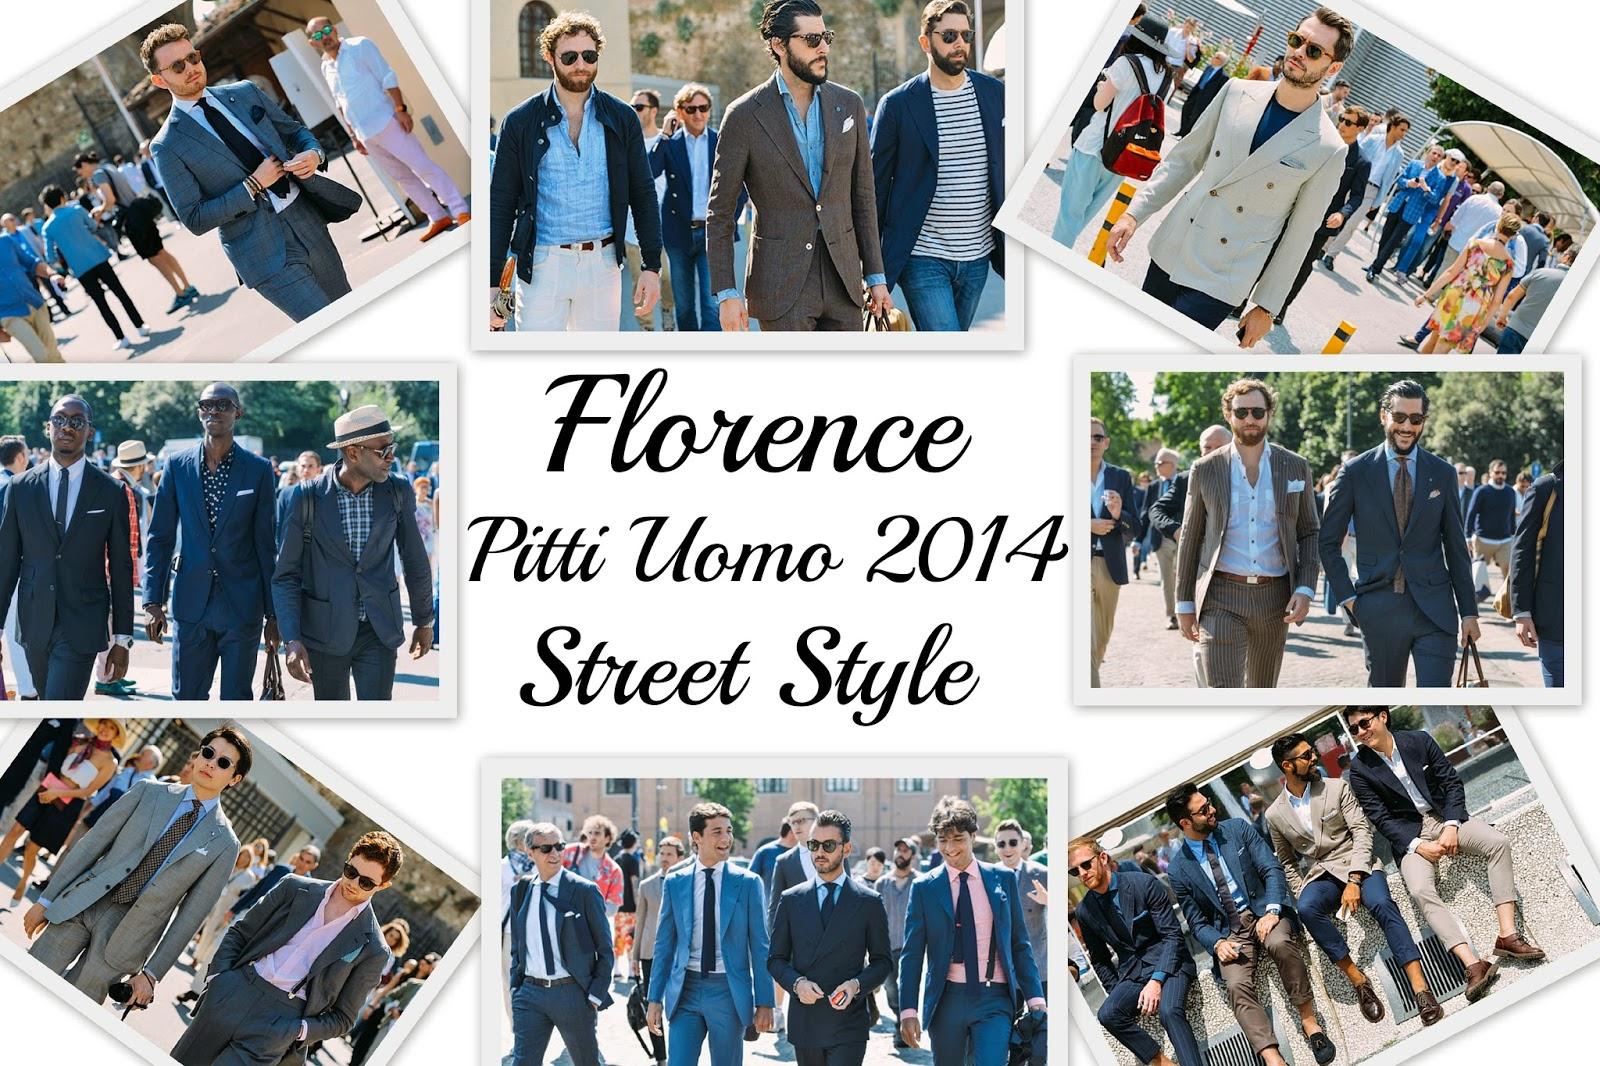 http://www.syriouslyinfashion.com/2014/06/pitti-uomo-2014-street-style-show.html